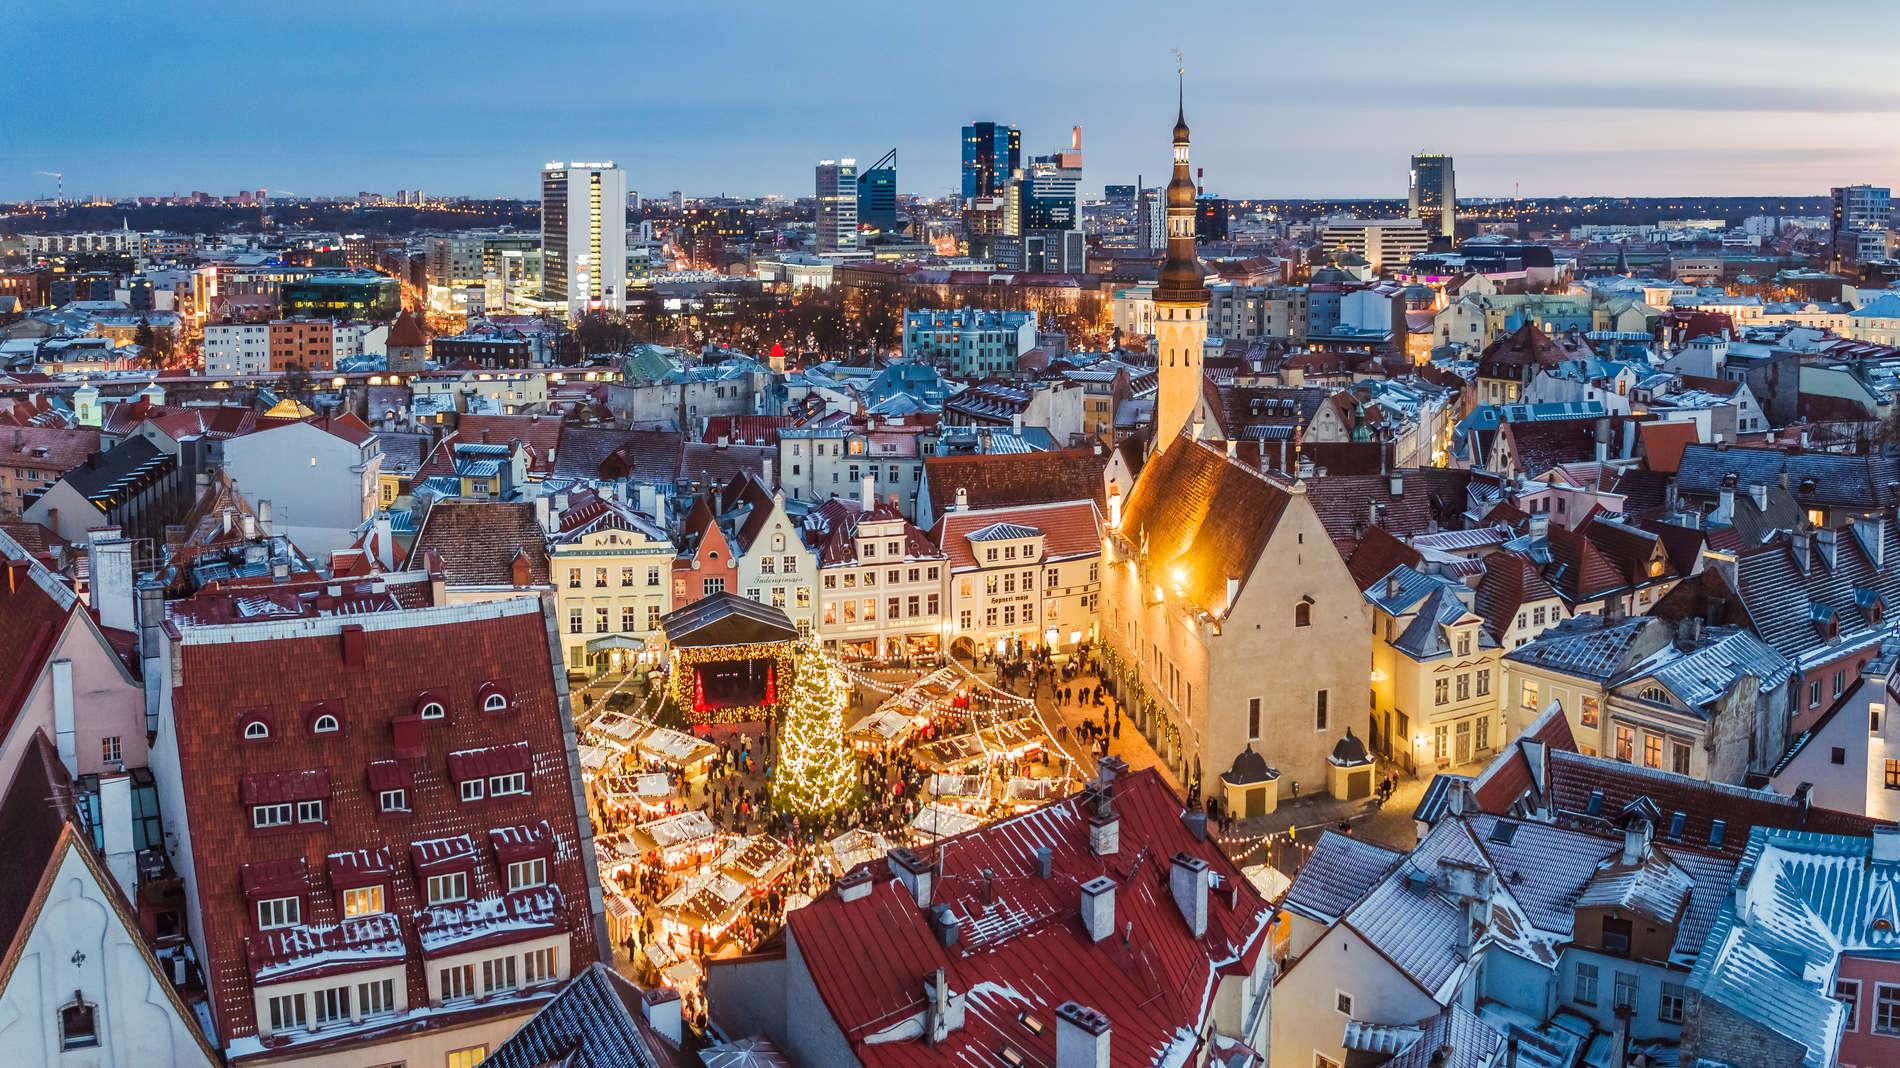 Christmas Market in Tallinn, Estonia. Photo by: Kaupo Kalda